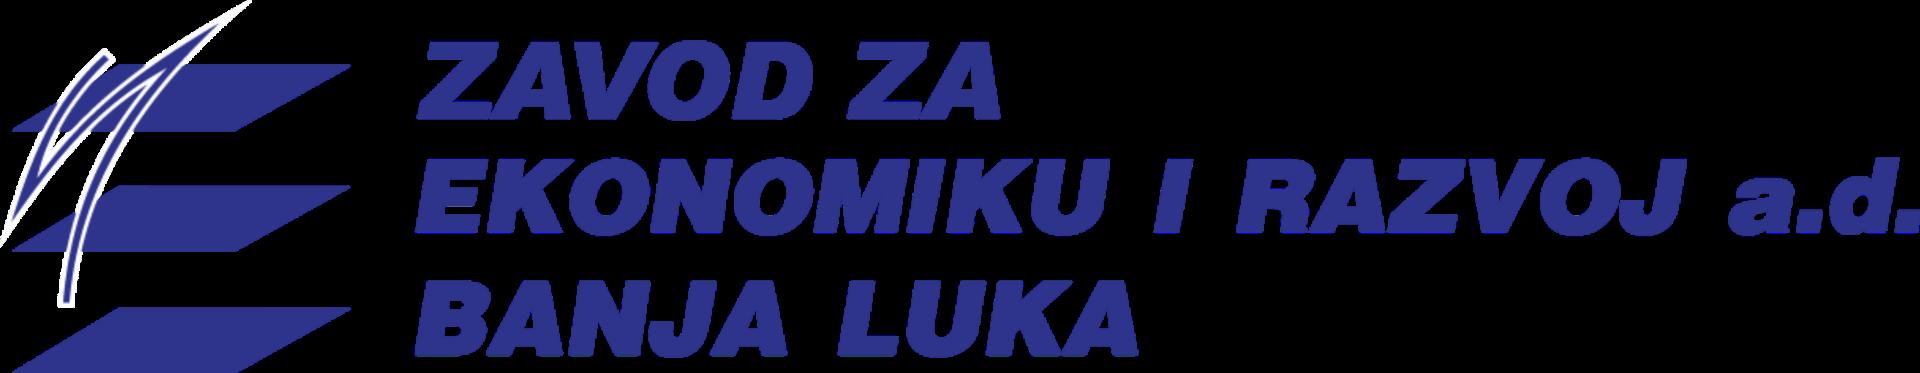 Zavod za ekonomiku i razvoj ad Banja Luka